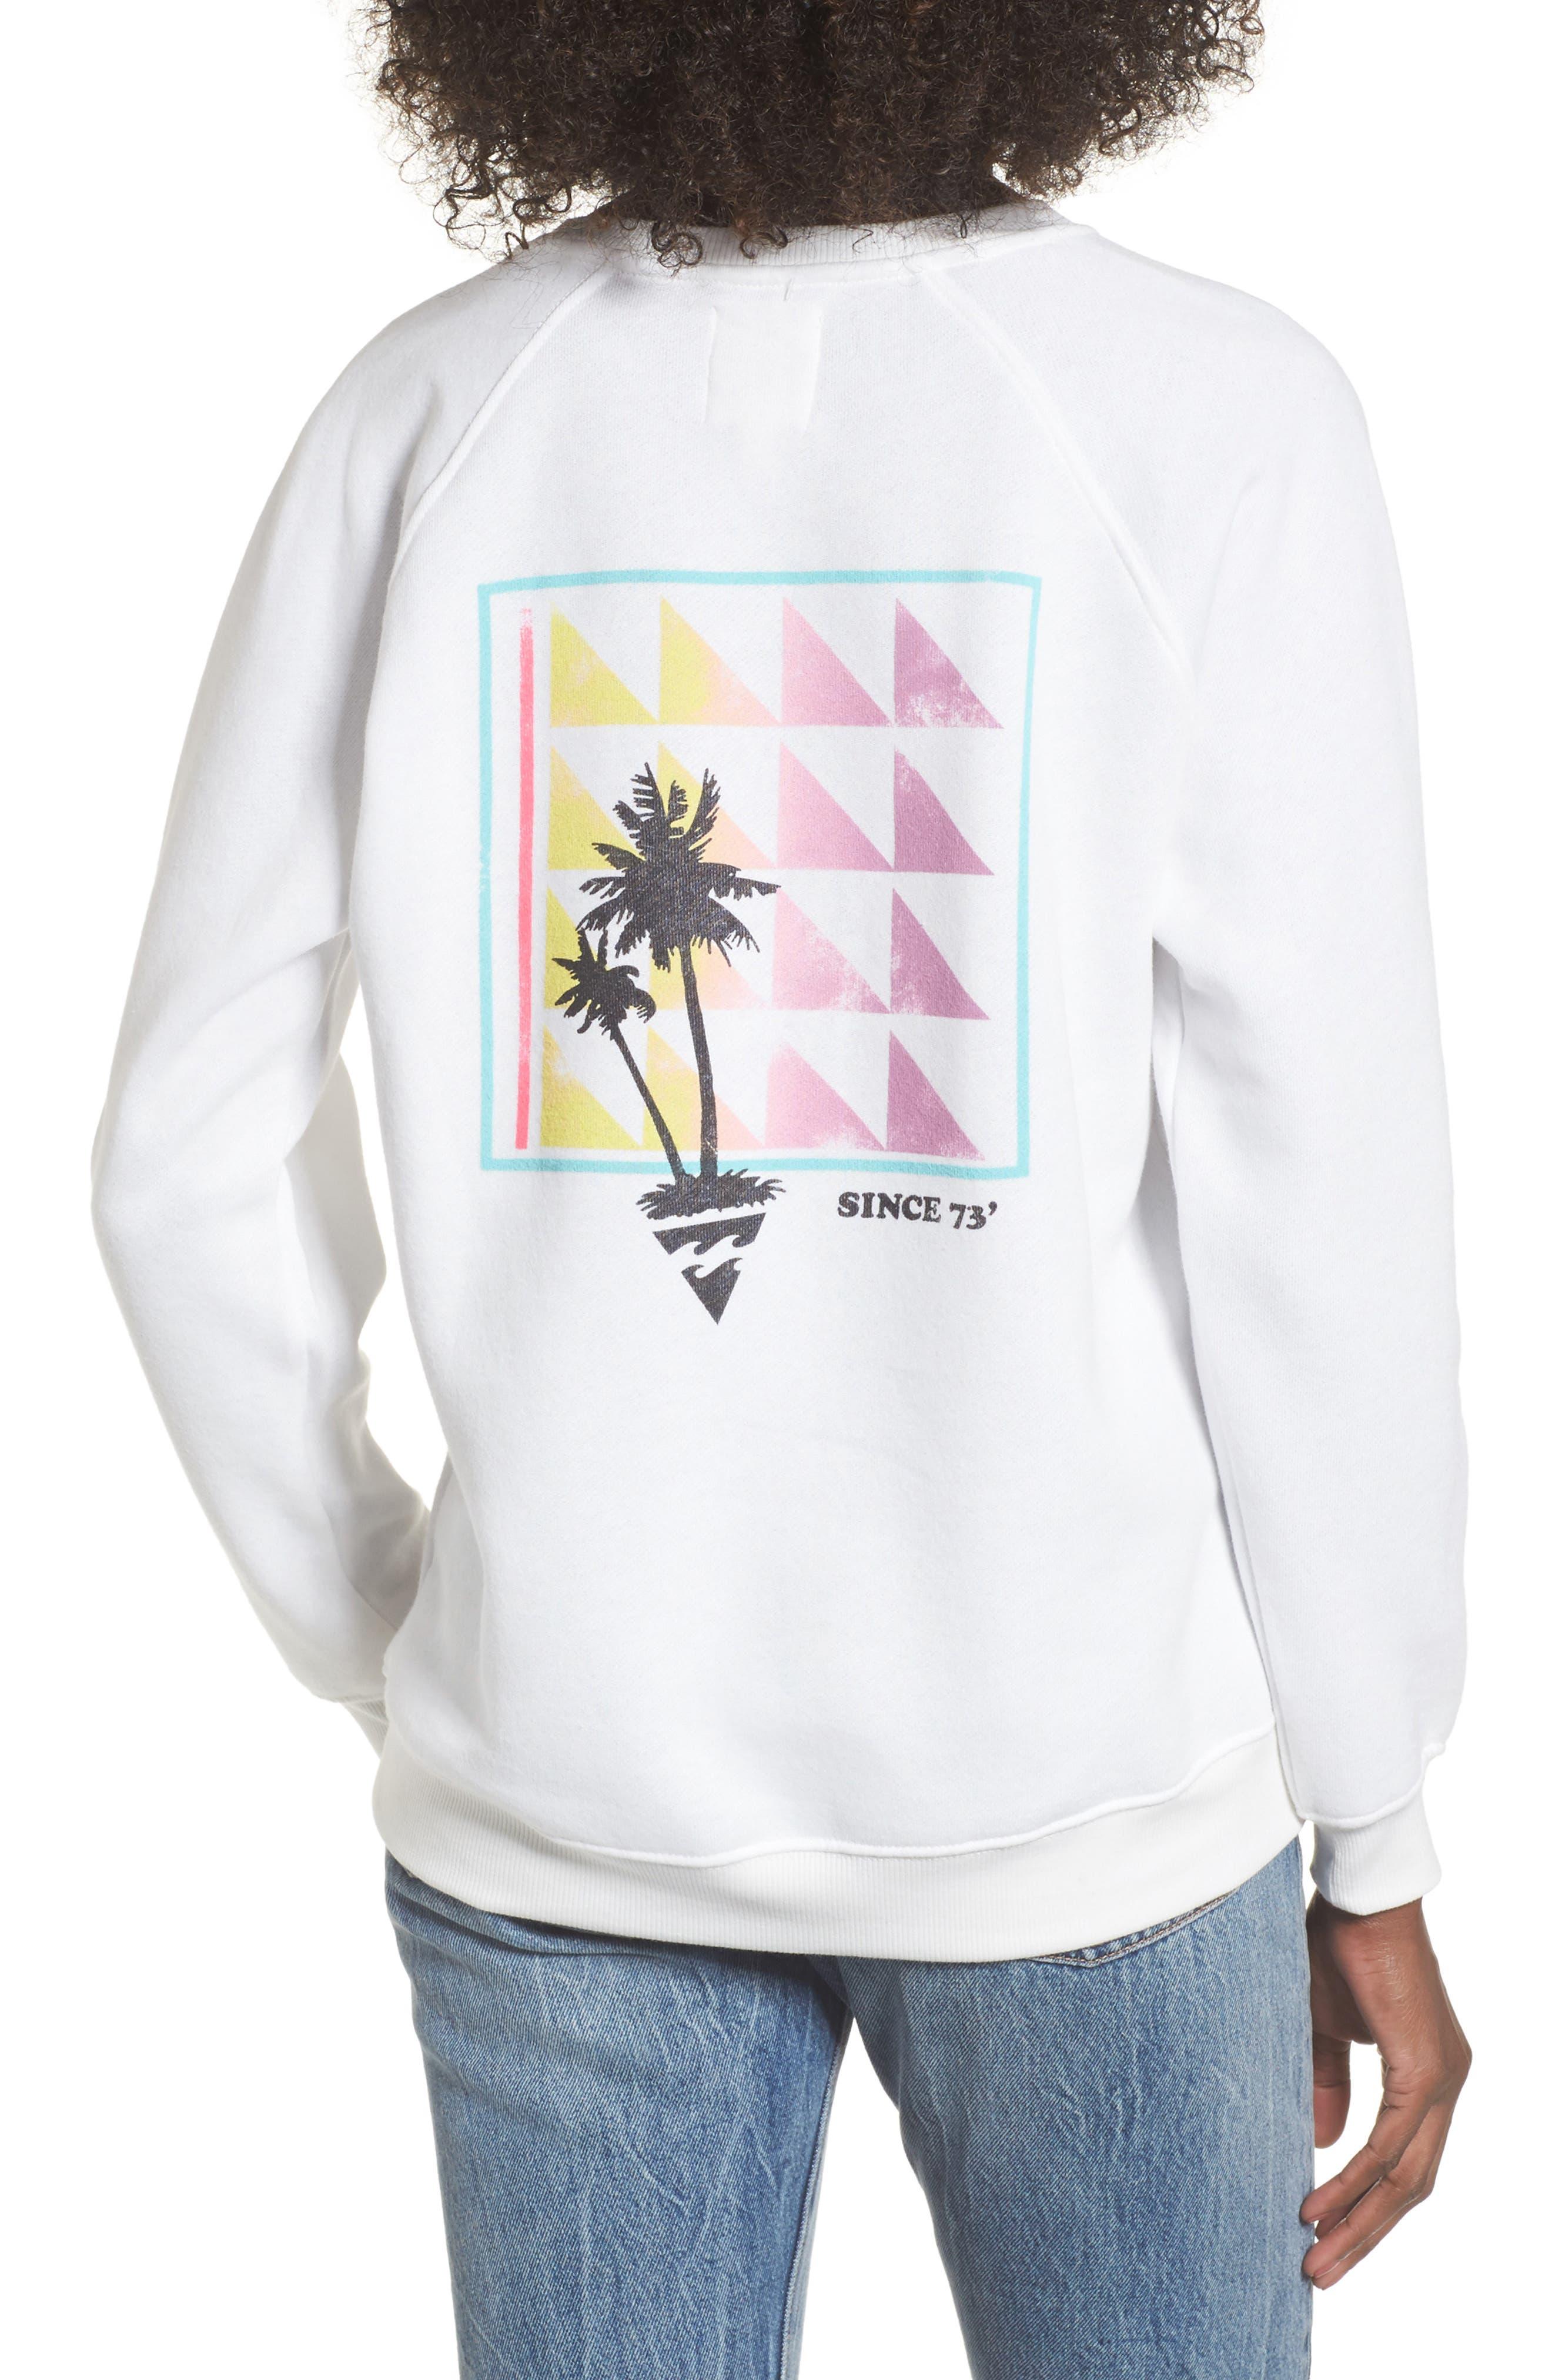 Since '73 Sweatshirt,                             Alternate thumbnail 2, color,                             Cool Wip